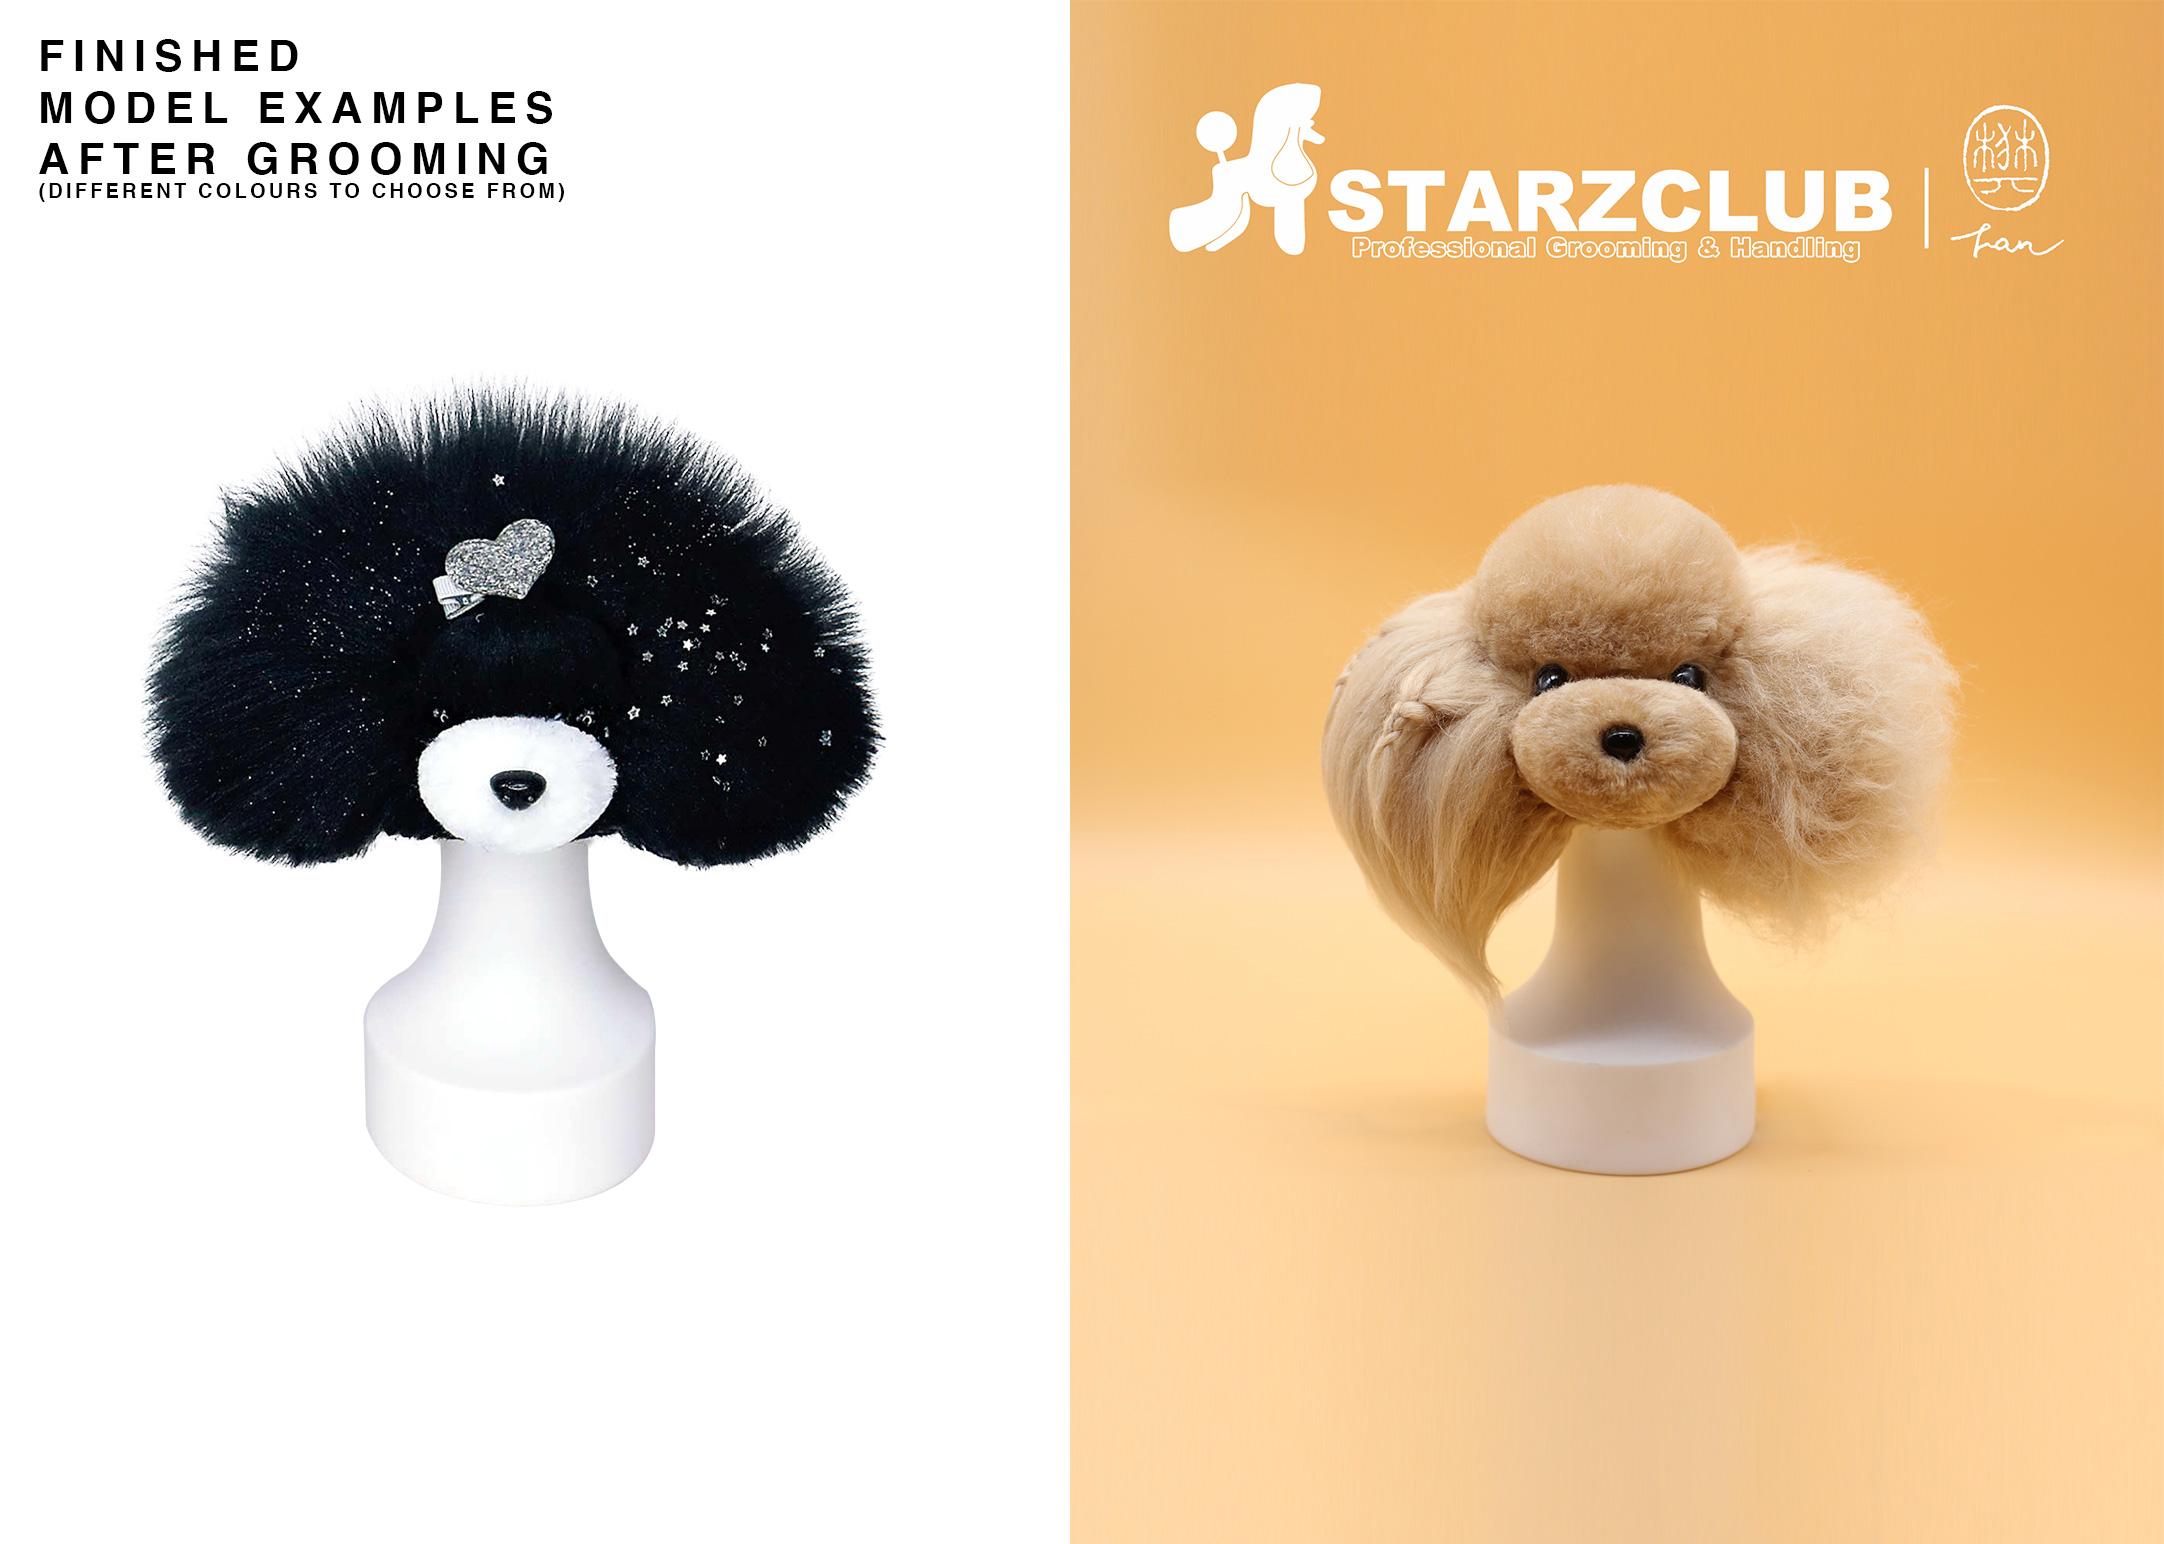 Starzclub White Coat for Model Dog Head